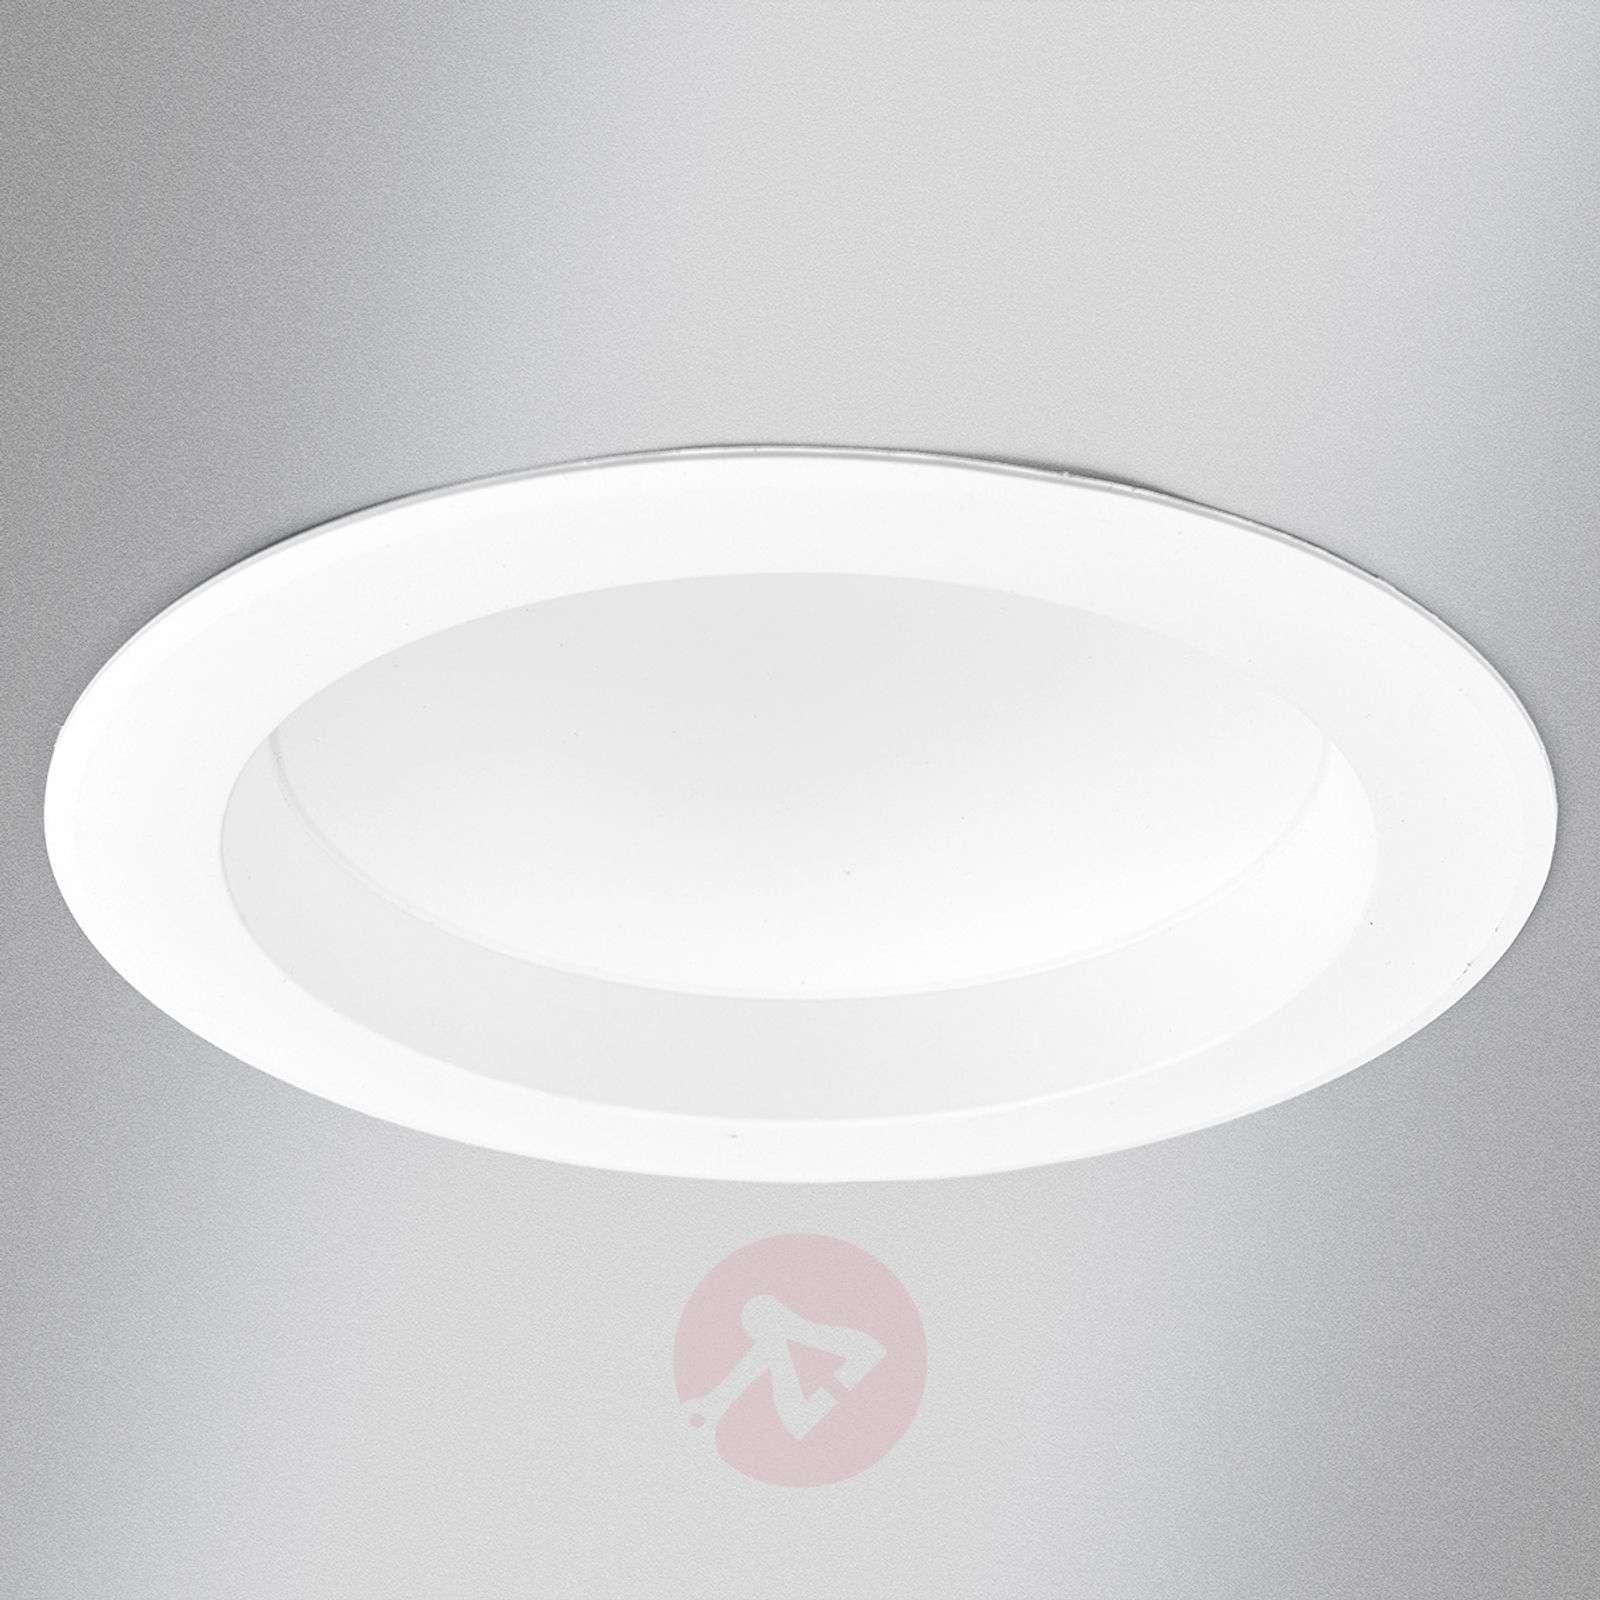 LED recessed ceiling light Arian, 17.4 cm, 15 W-9978011-03